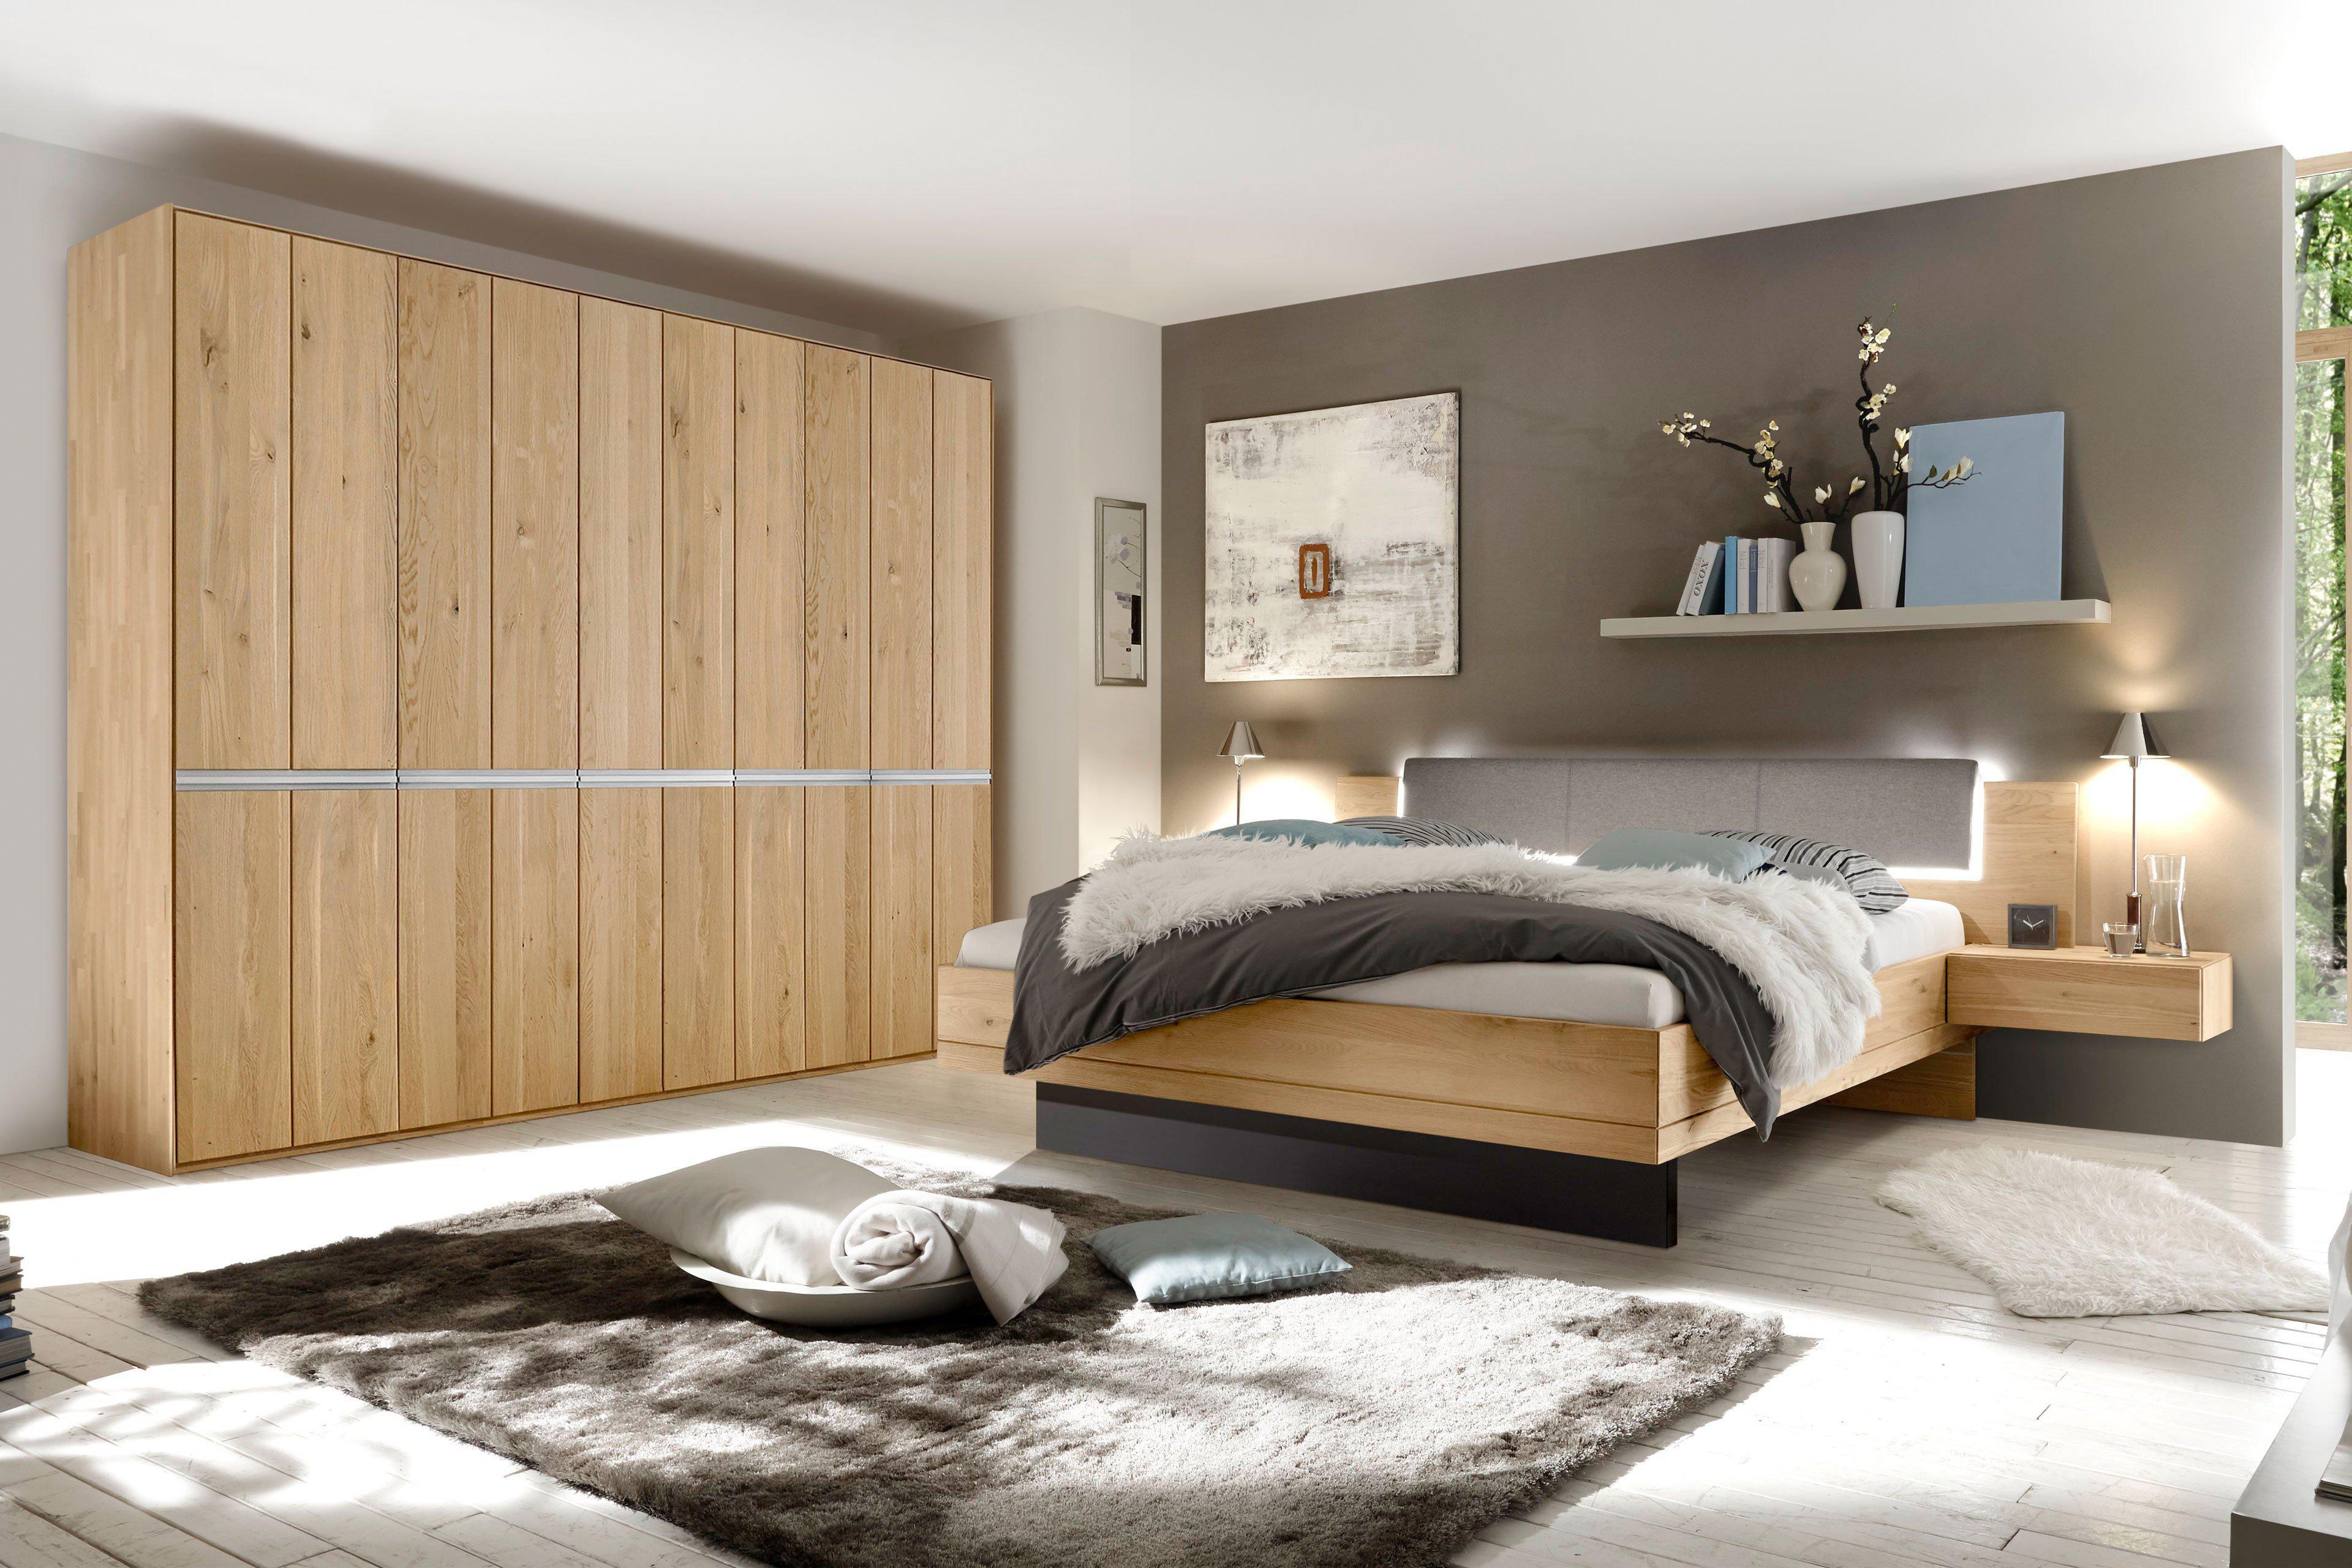 loddenkemper leno schlafzimmer set eiche m bel letz ihr online shop. Black Bedroom Furniture Sets. Home Design Ideas